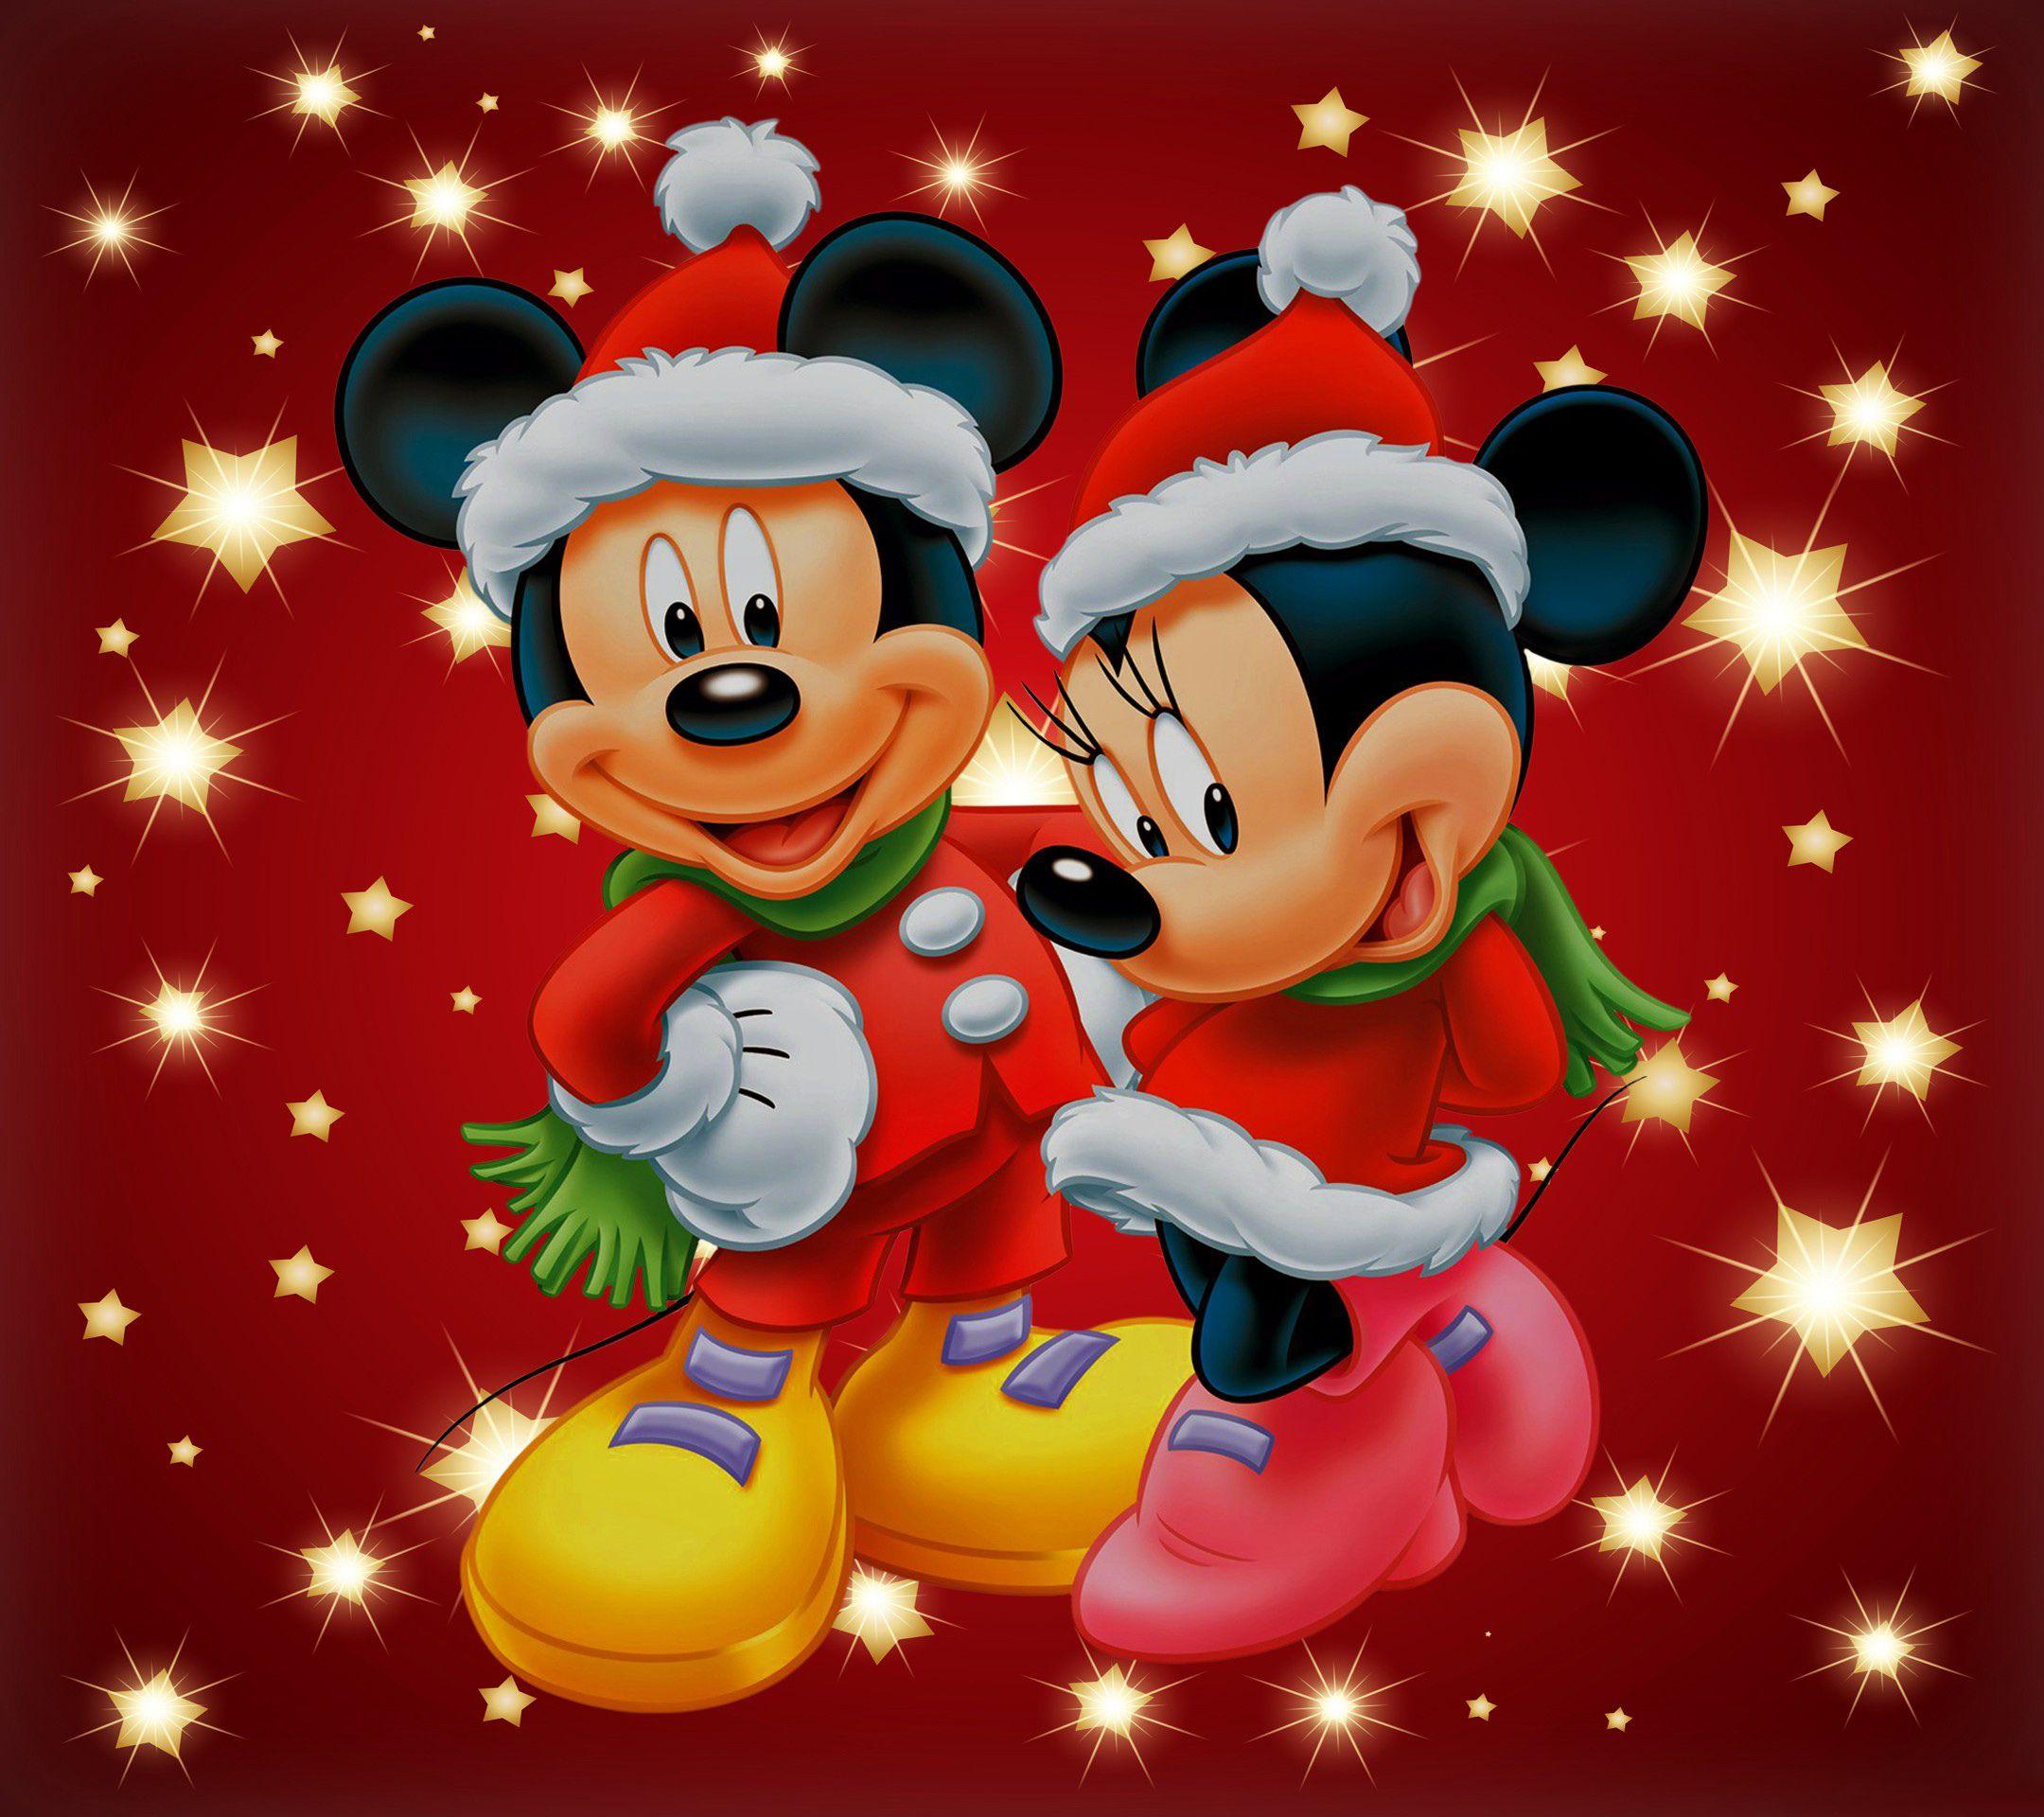 Mickey Mouse Ipad Wallpaper Dibujos Animados Navidenos Fondo De Mickey Mouse Mickey Mouse Navideno